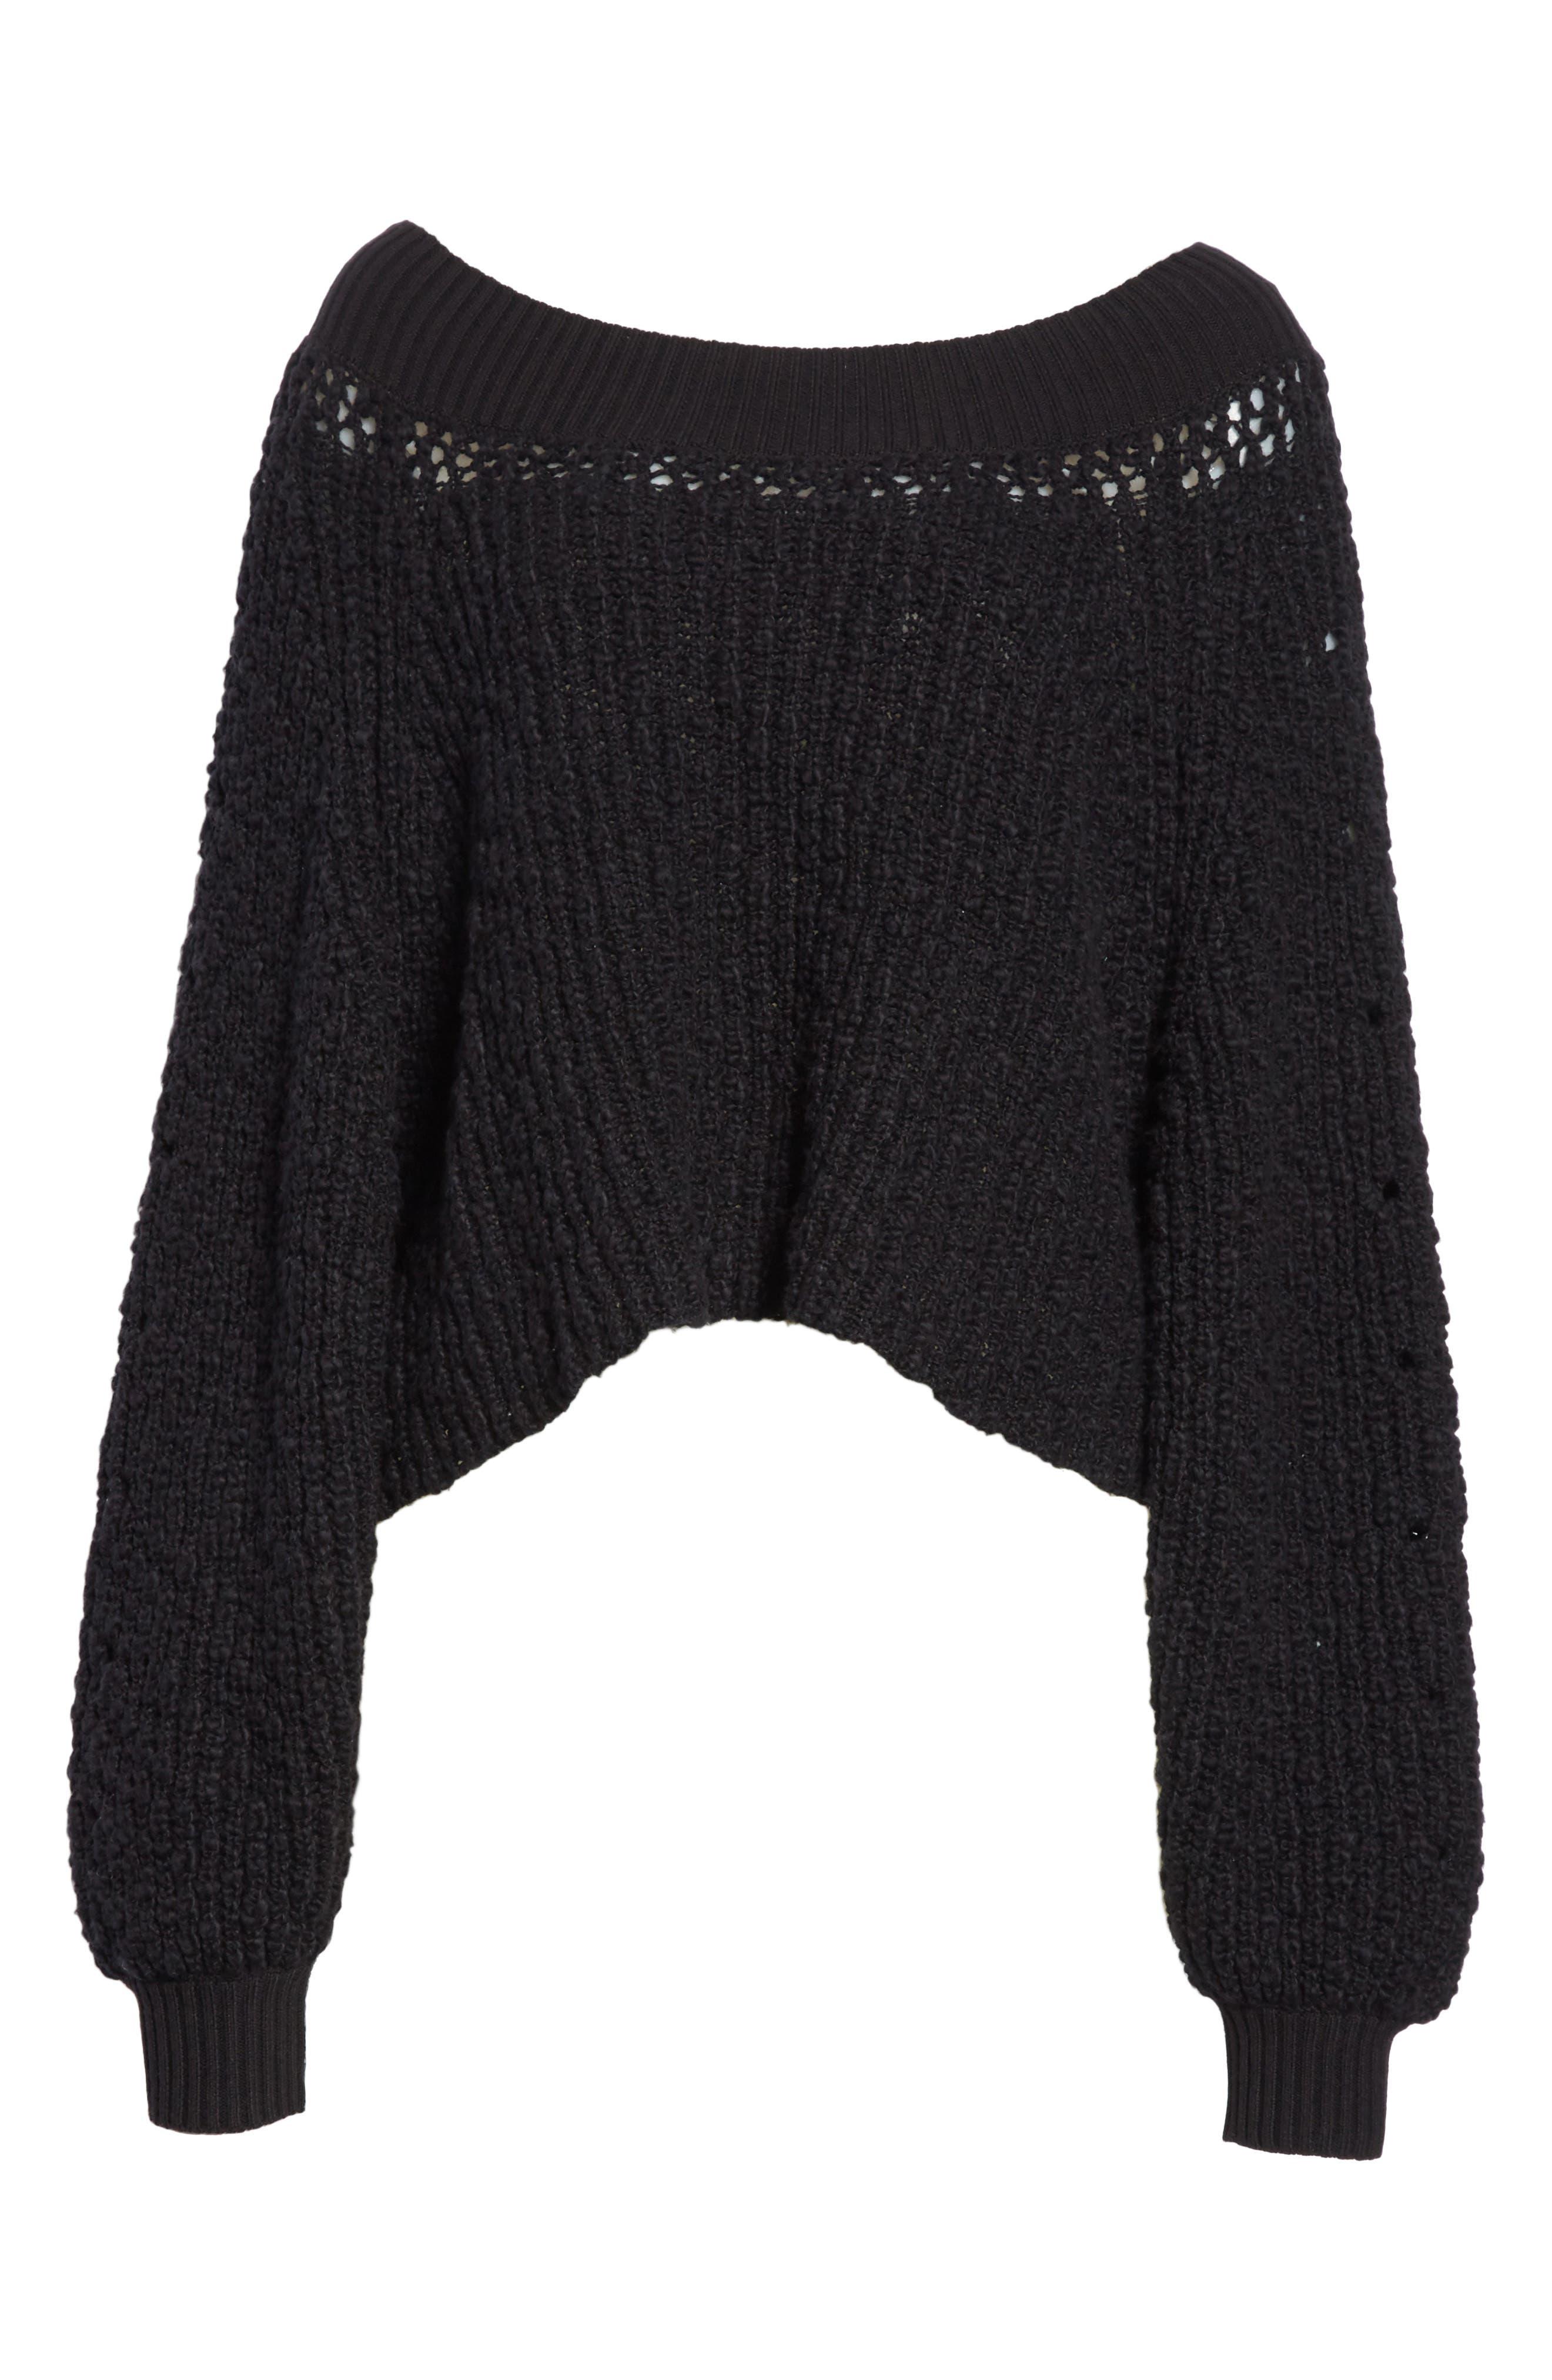 Pandora's Boatneck Sweater,                             Alternate thumbnail 6, color,                             001